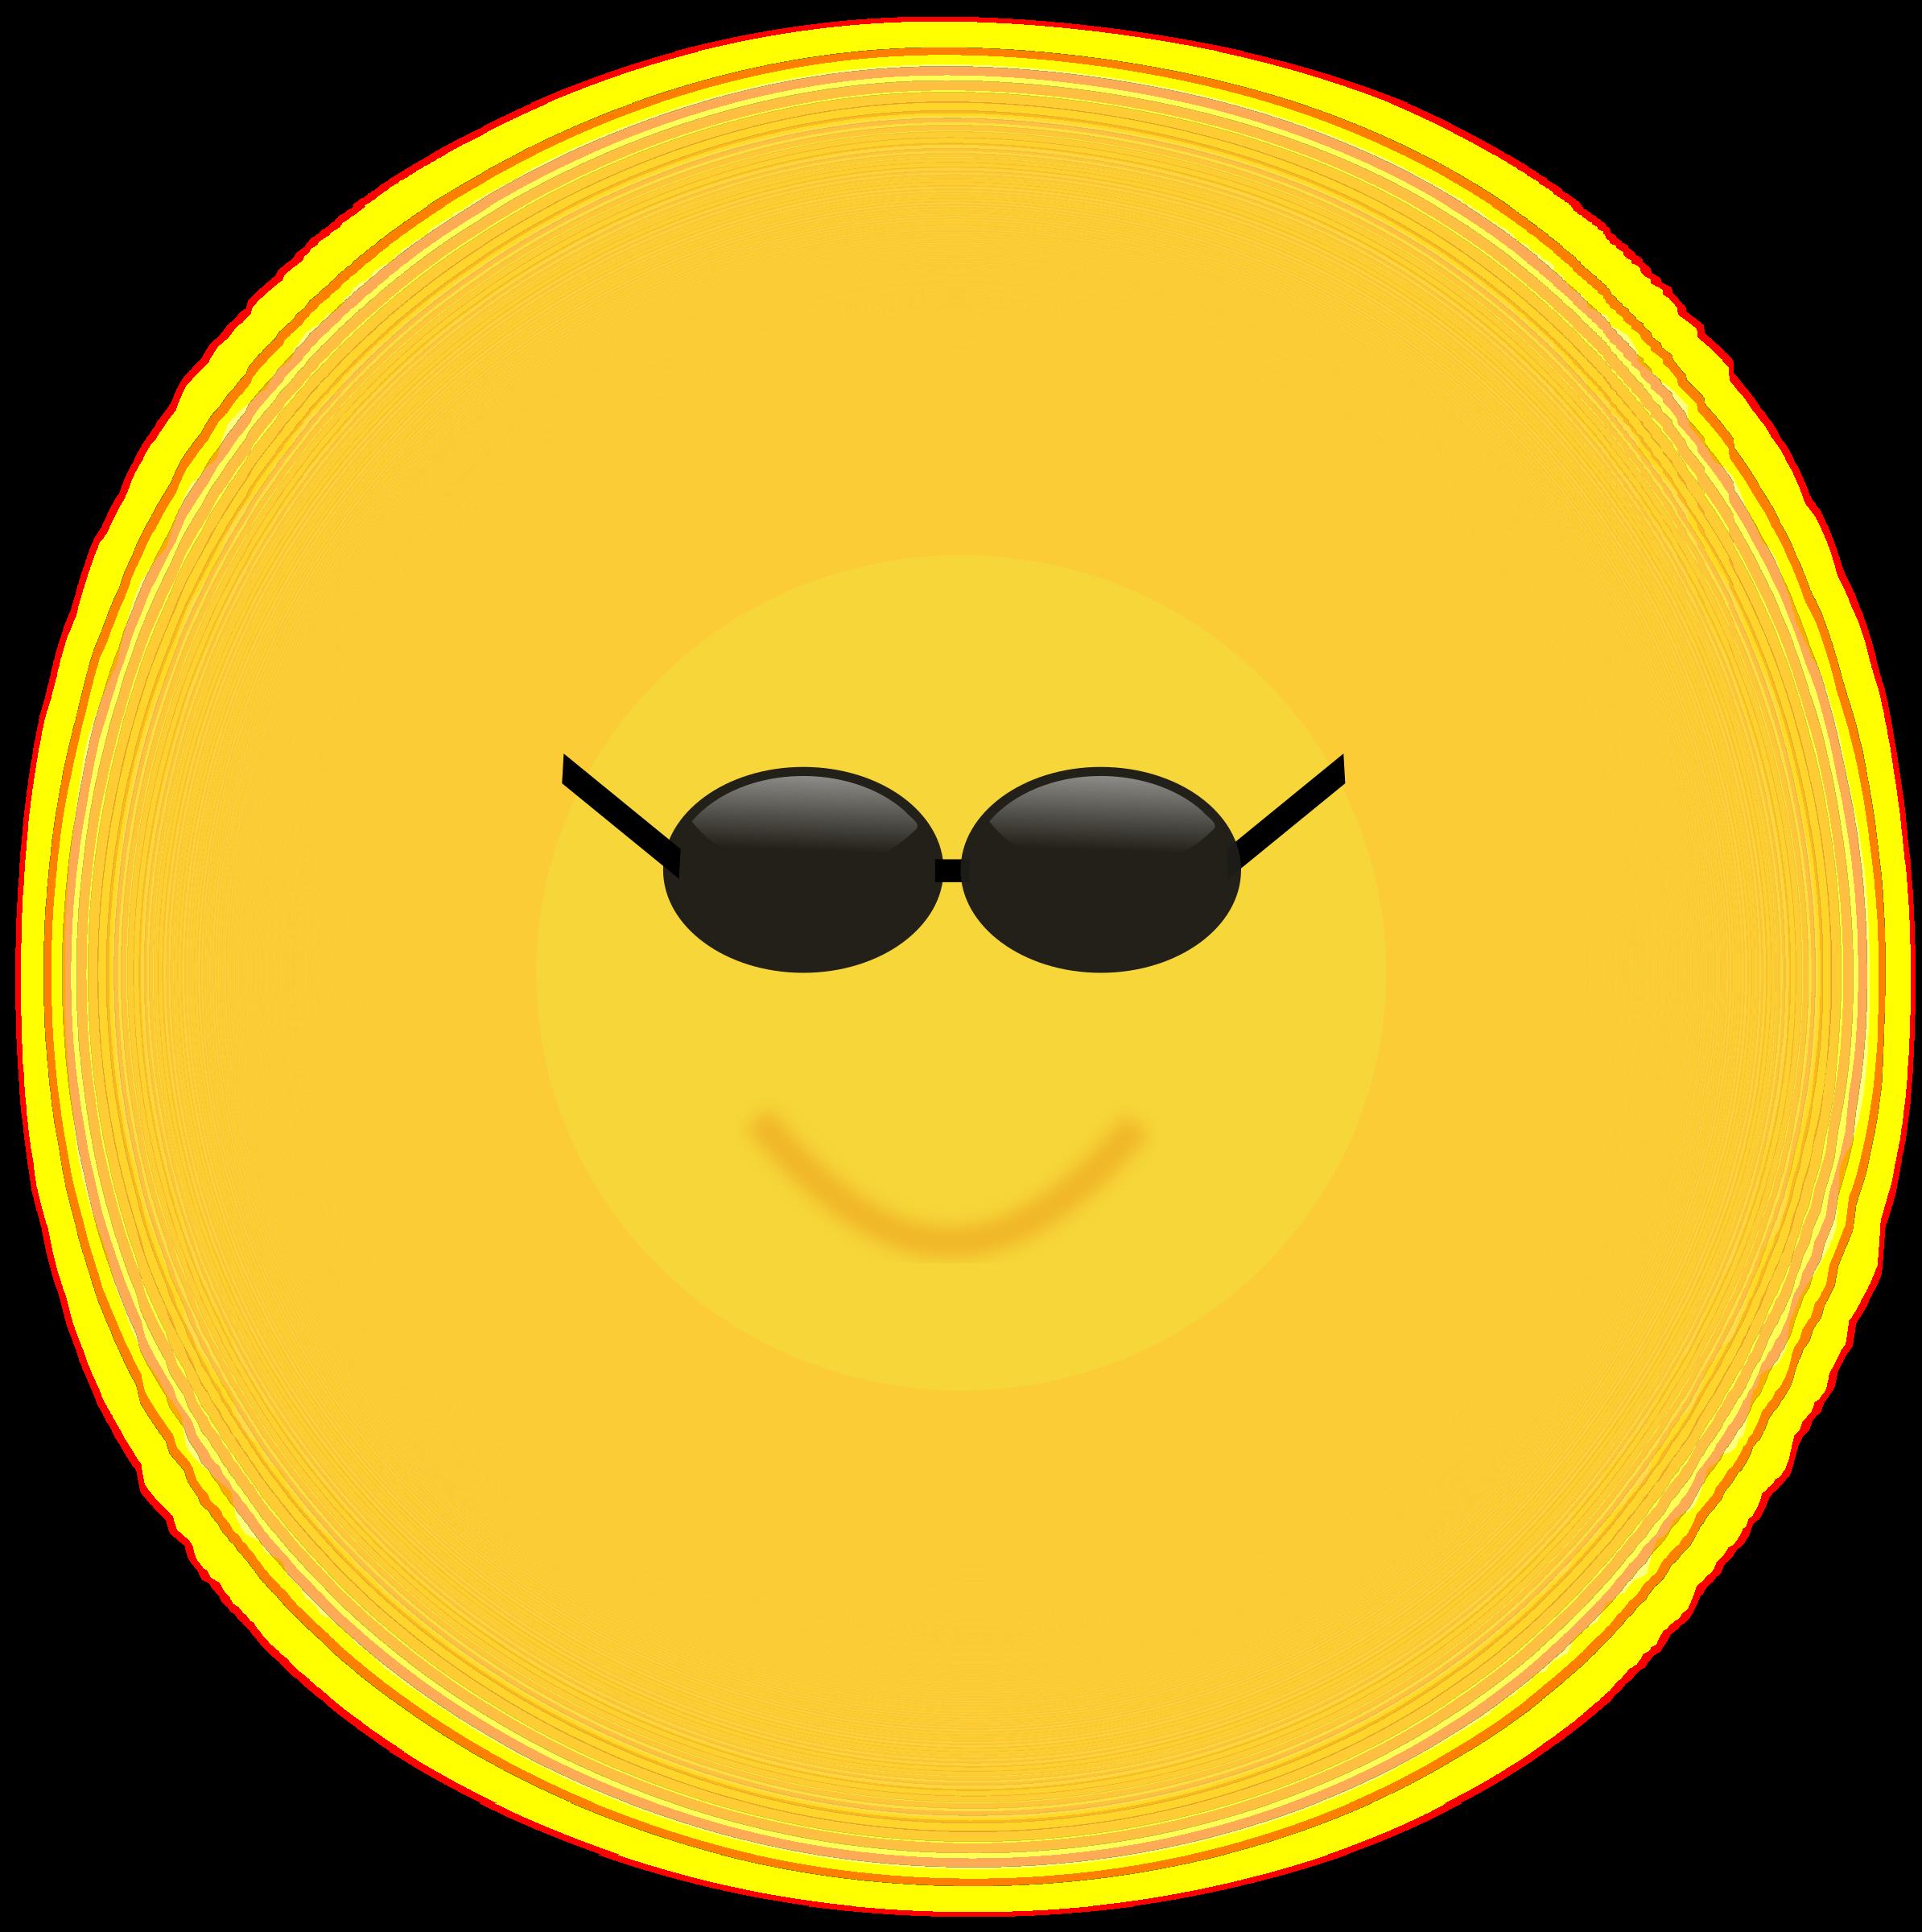 Sunglasses clipart cartoon. Cool sun big image